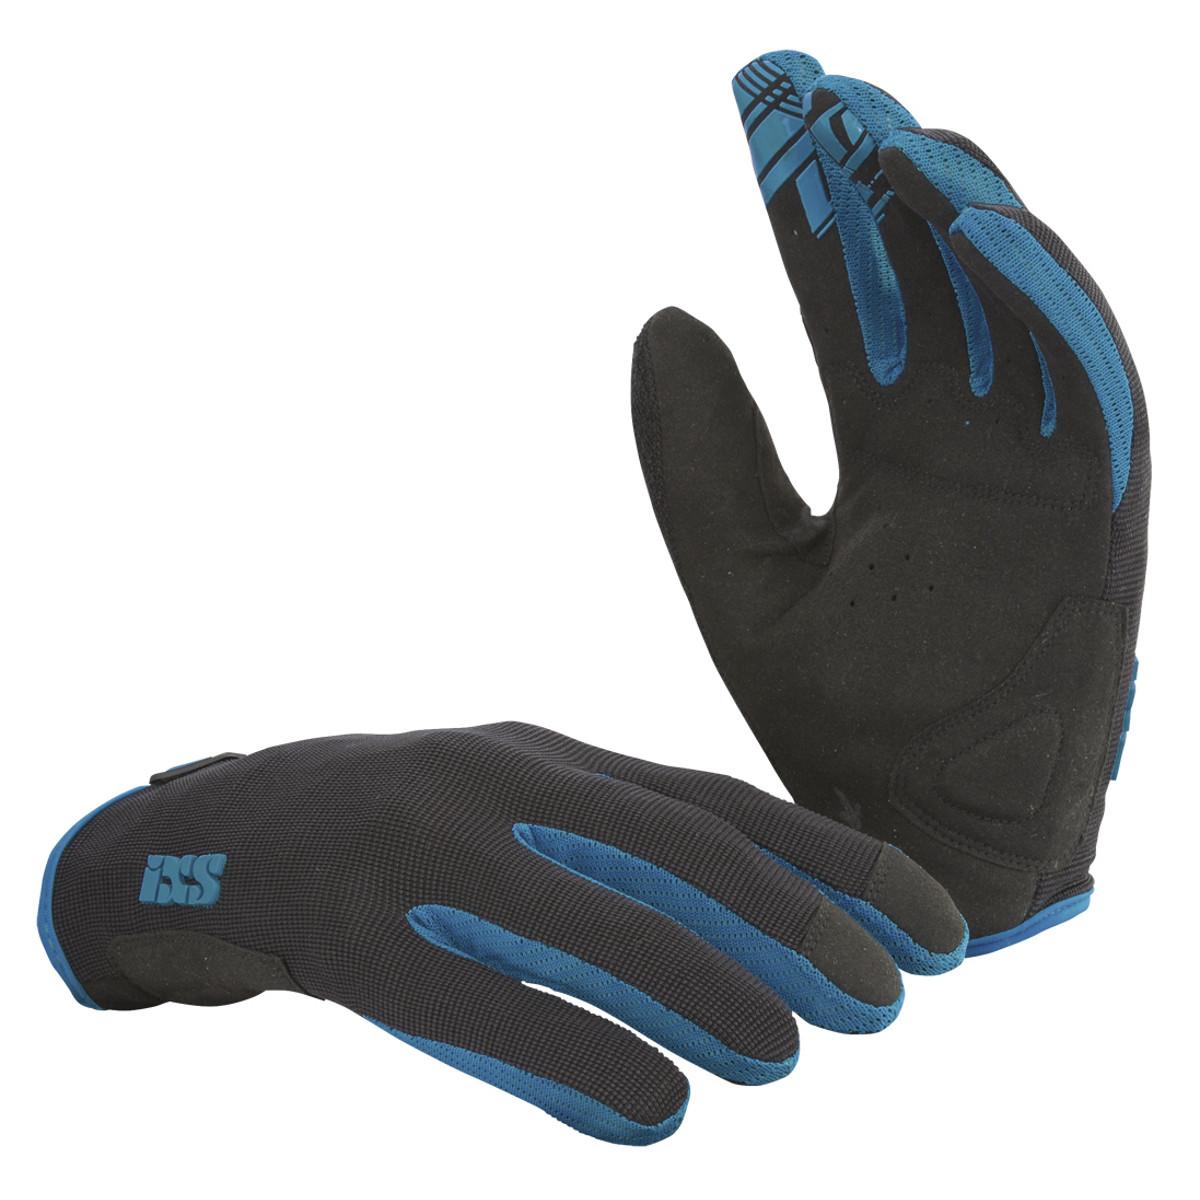 IXS Downhill-Handschuhe TR-X1.1, M, Schwarz